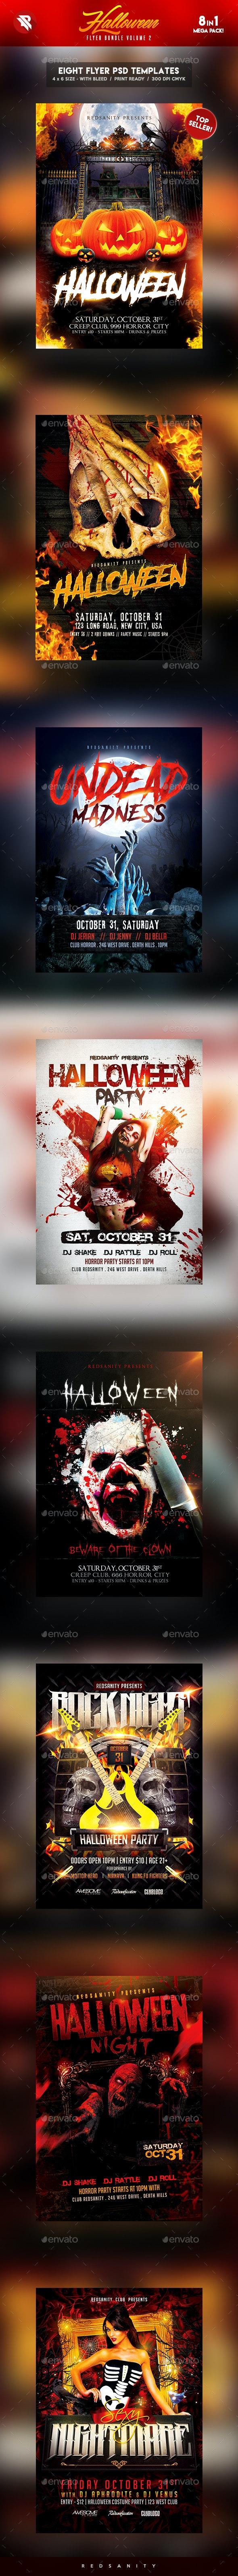 Halloween Flyer Bundle Vol.2 - Holidays Events